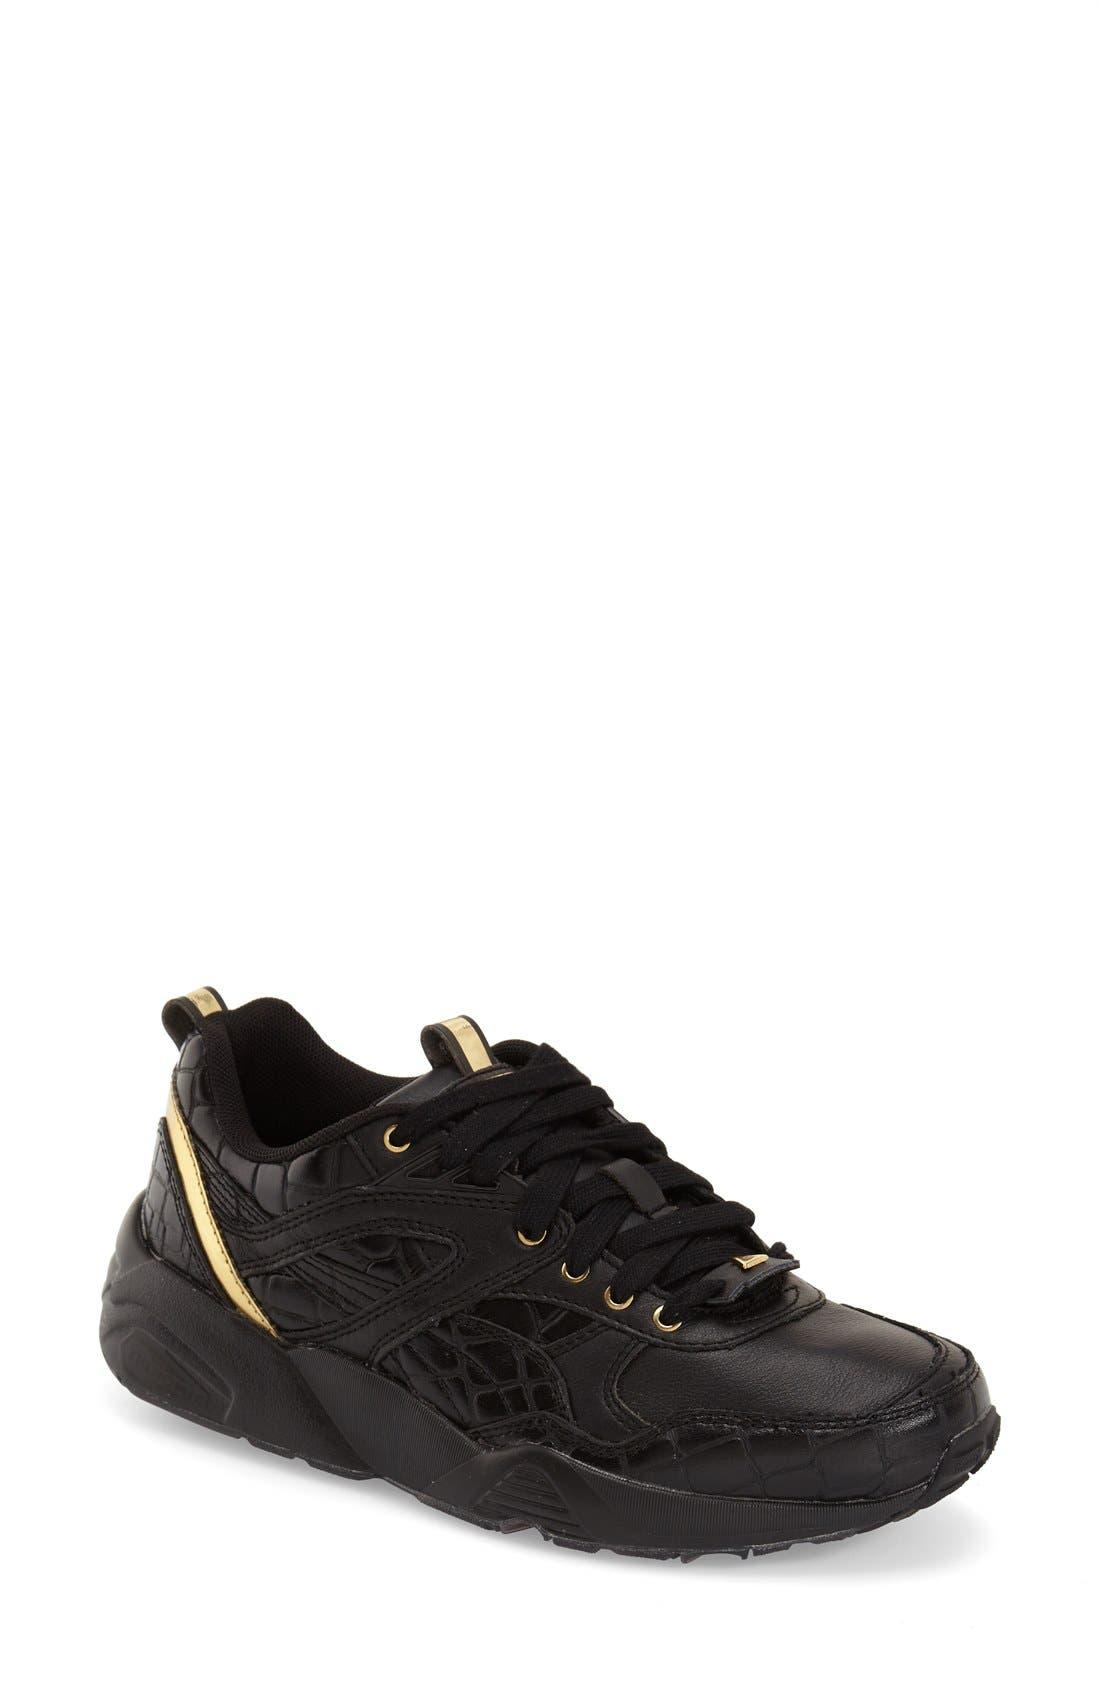 Alternate Image 1 Selected - PUMA 'Trinomic R698 Exotic' Sneaker (Women)